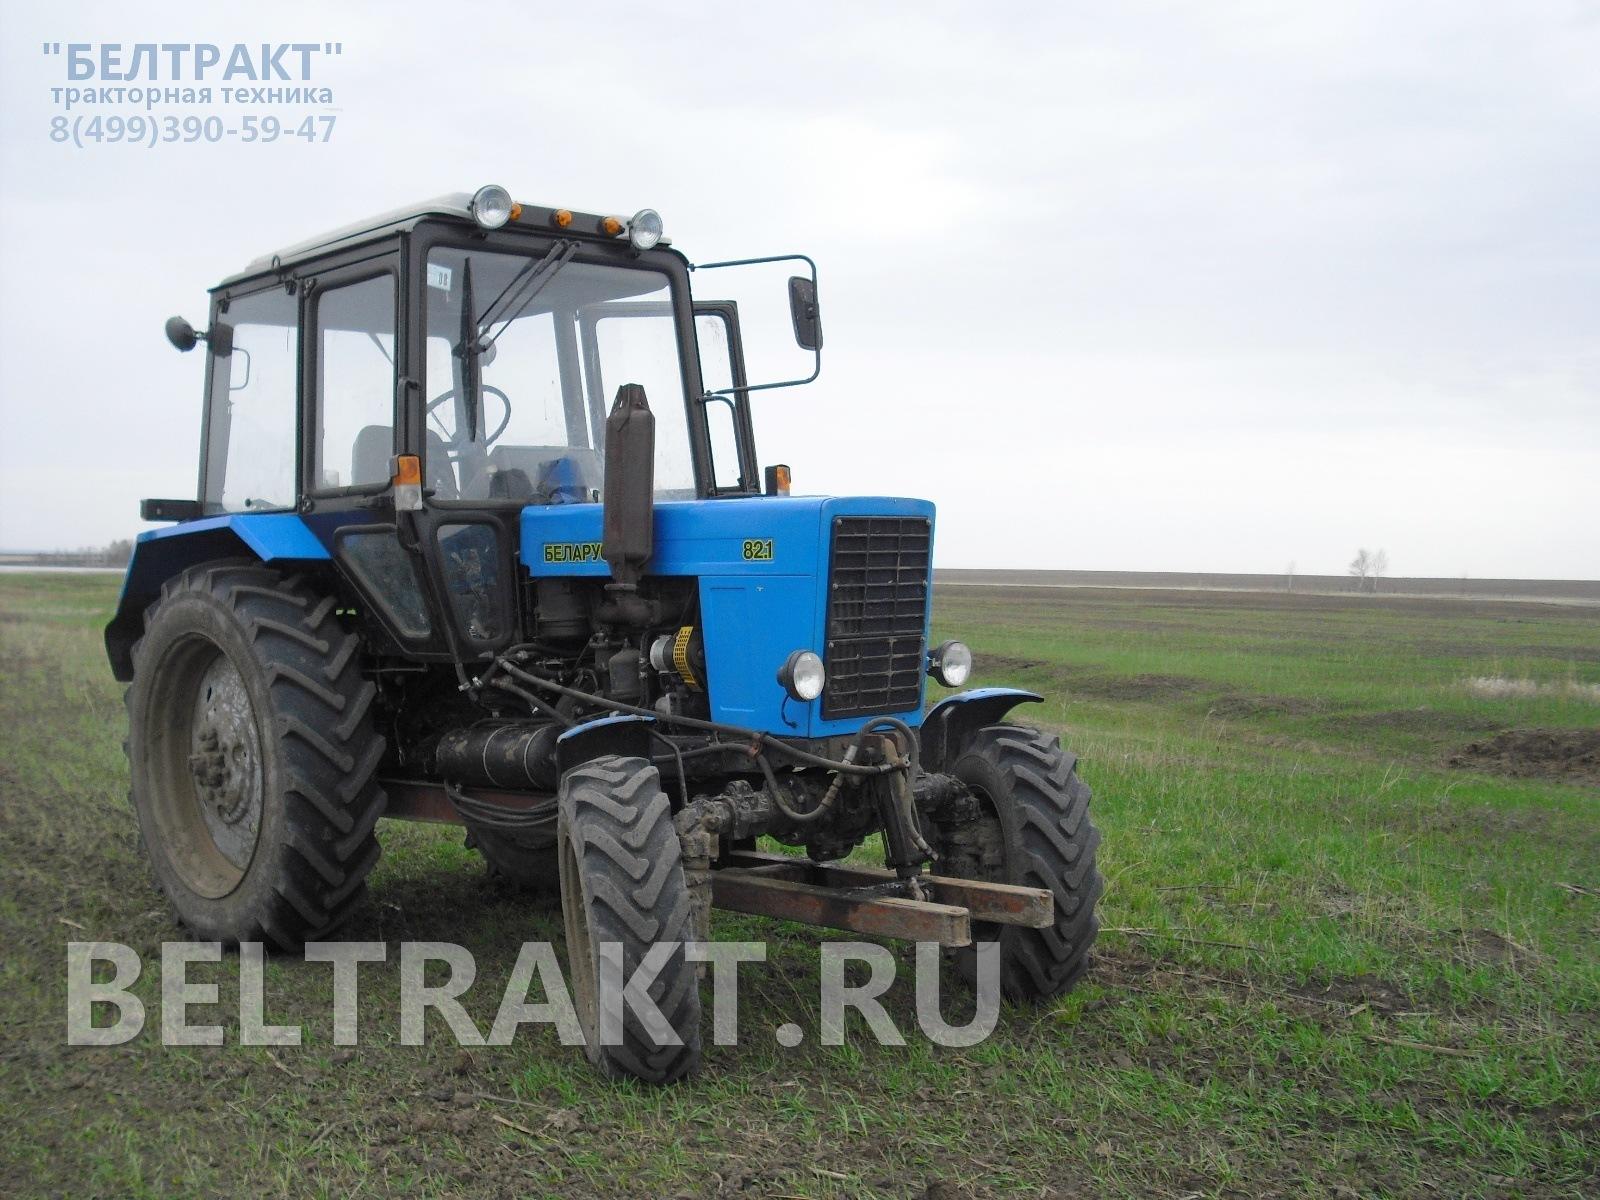 Трактор МТЗ 82.1 – отзывы - otzyv.expert